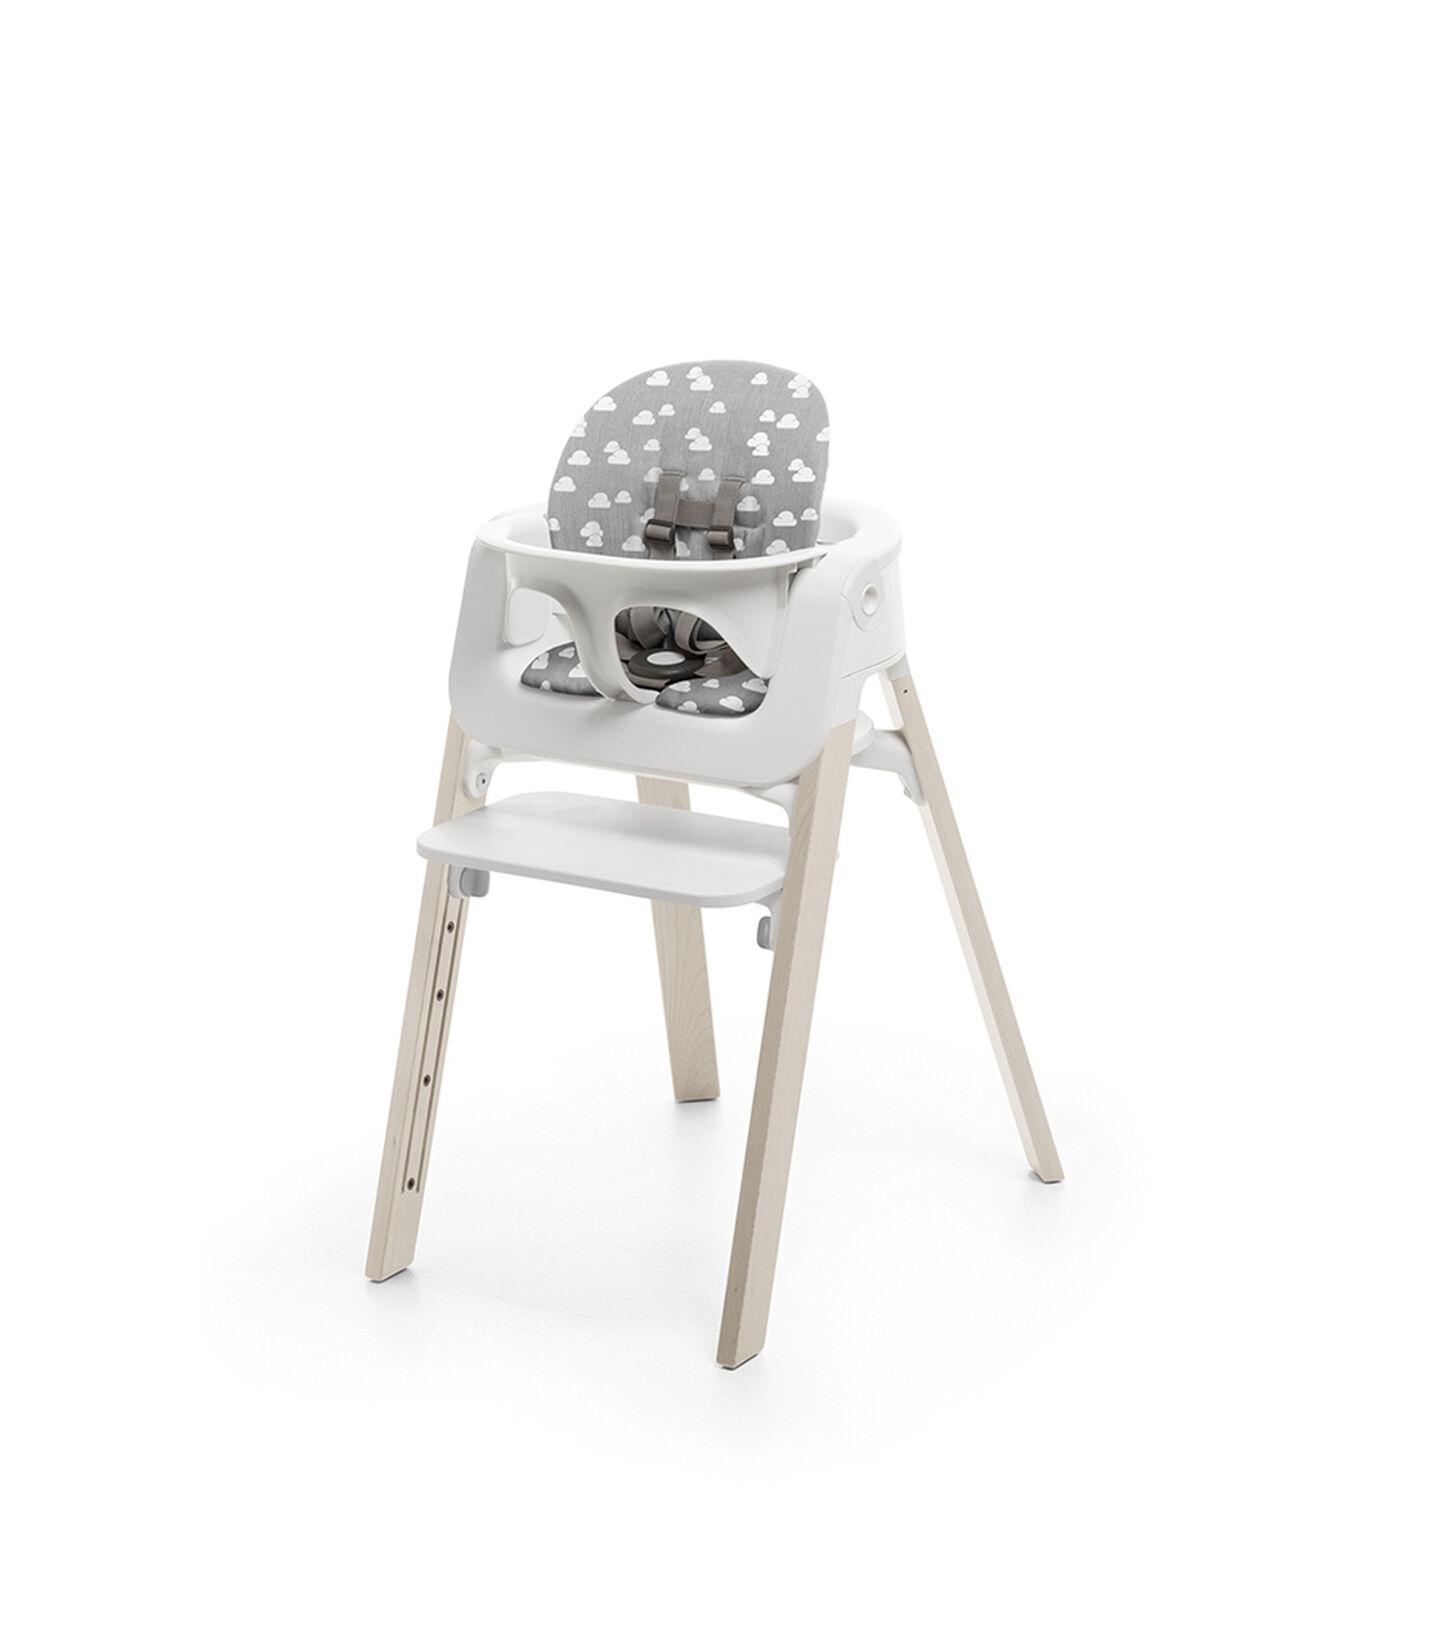 Stokke® Steps™ Baby Set kussen in de kleur Grey Clouds, Grey Clouds, mainview view 3